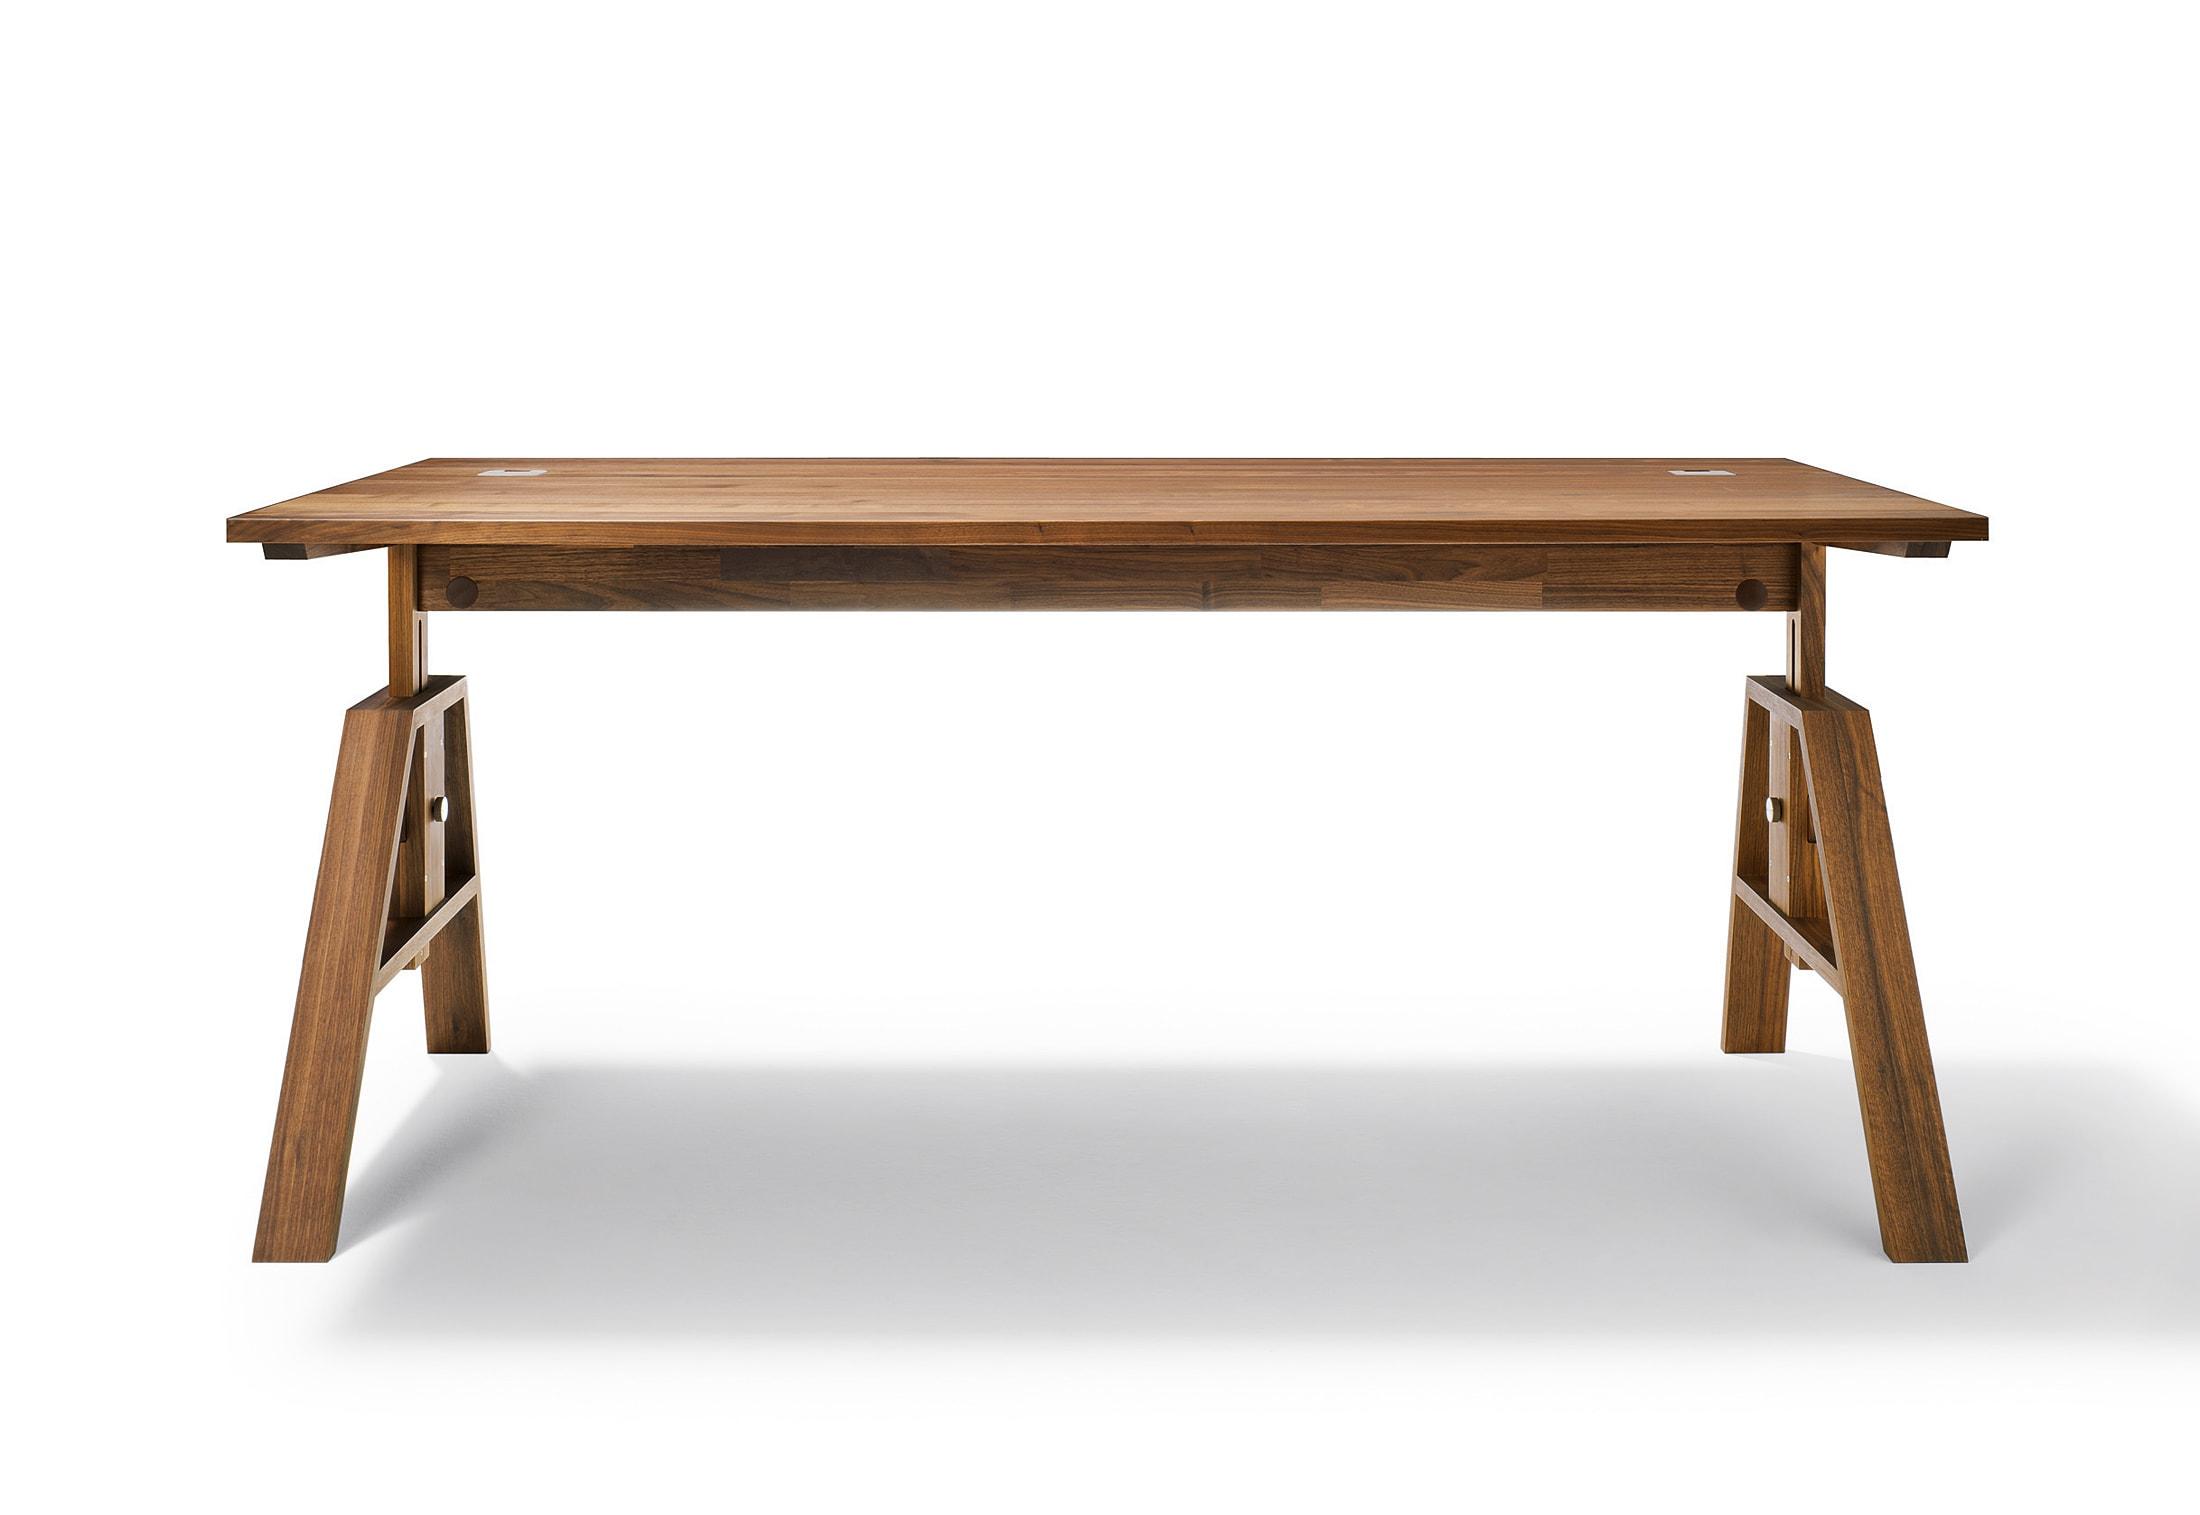 e518cdaef Pracovné stoly | Kancelársky nábytok